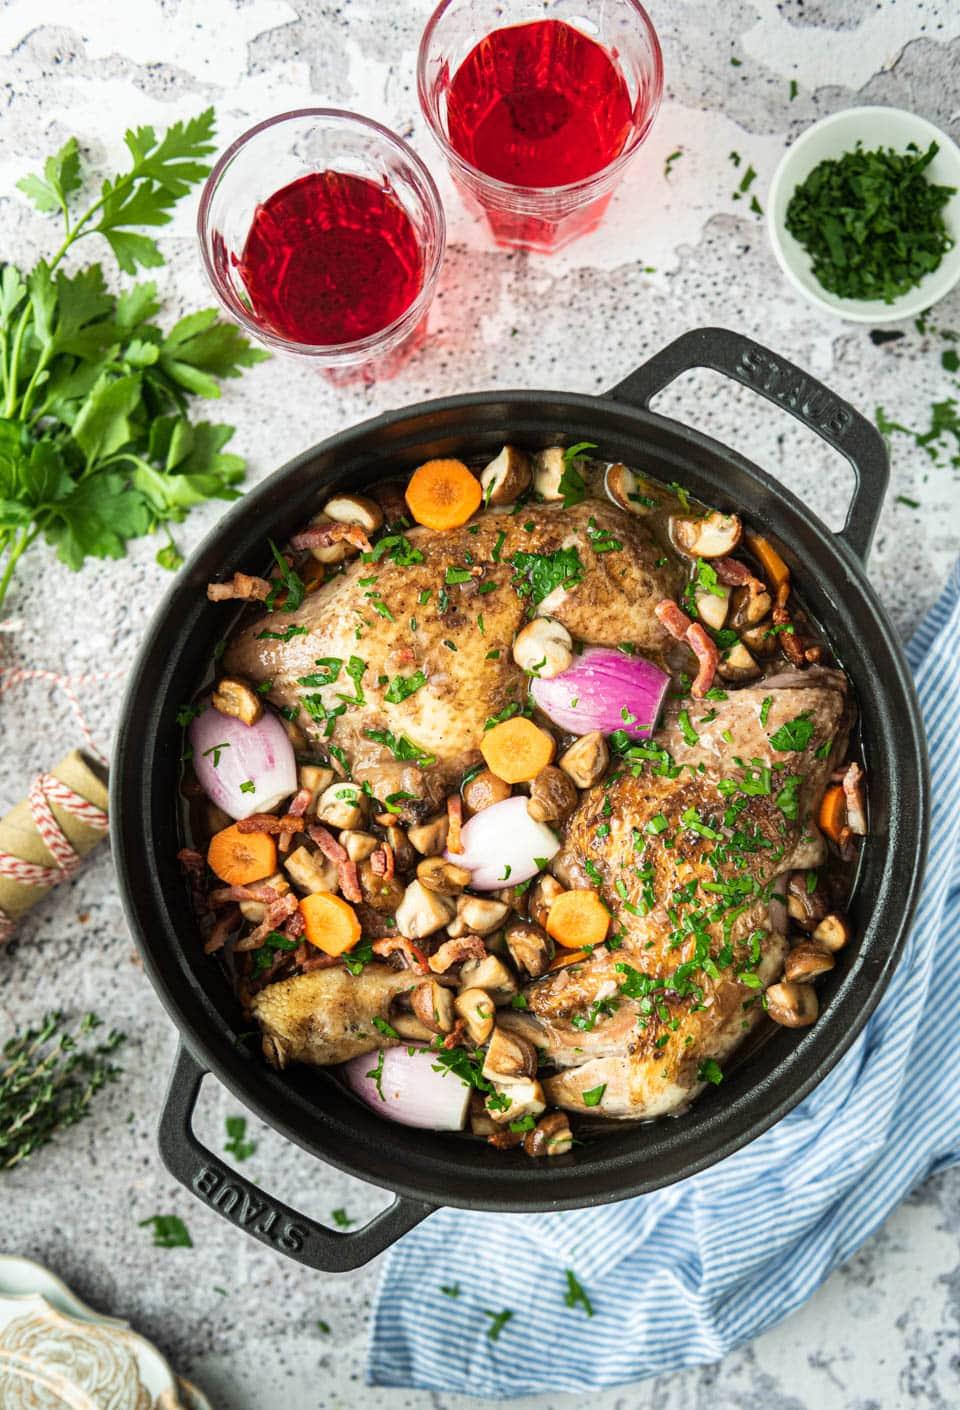 Coq au vin - kip in rode wijnsaus